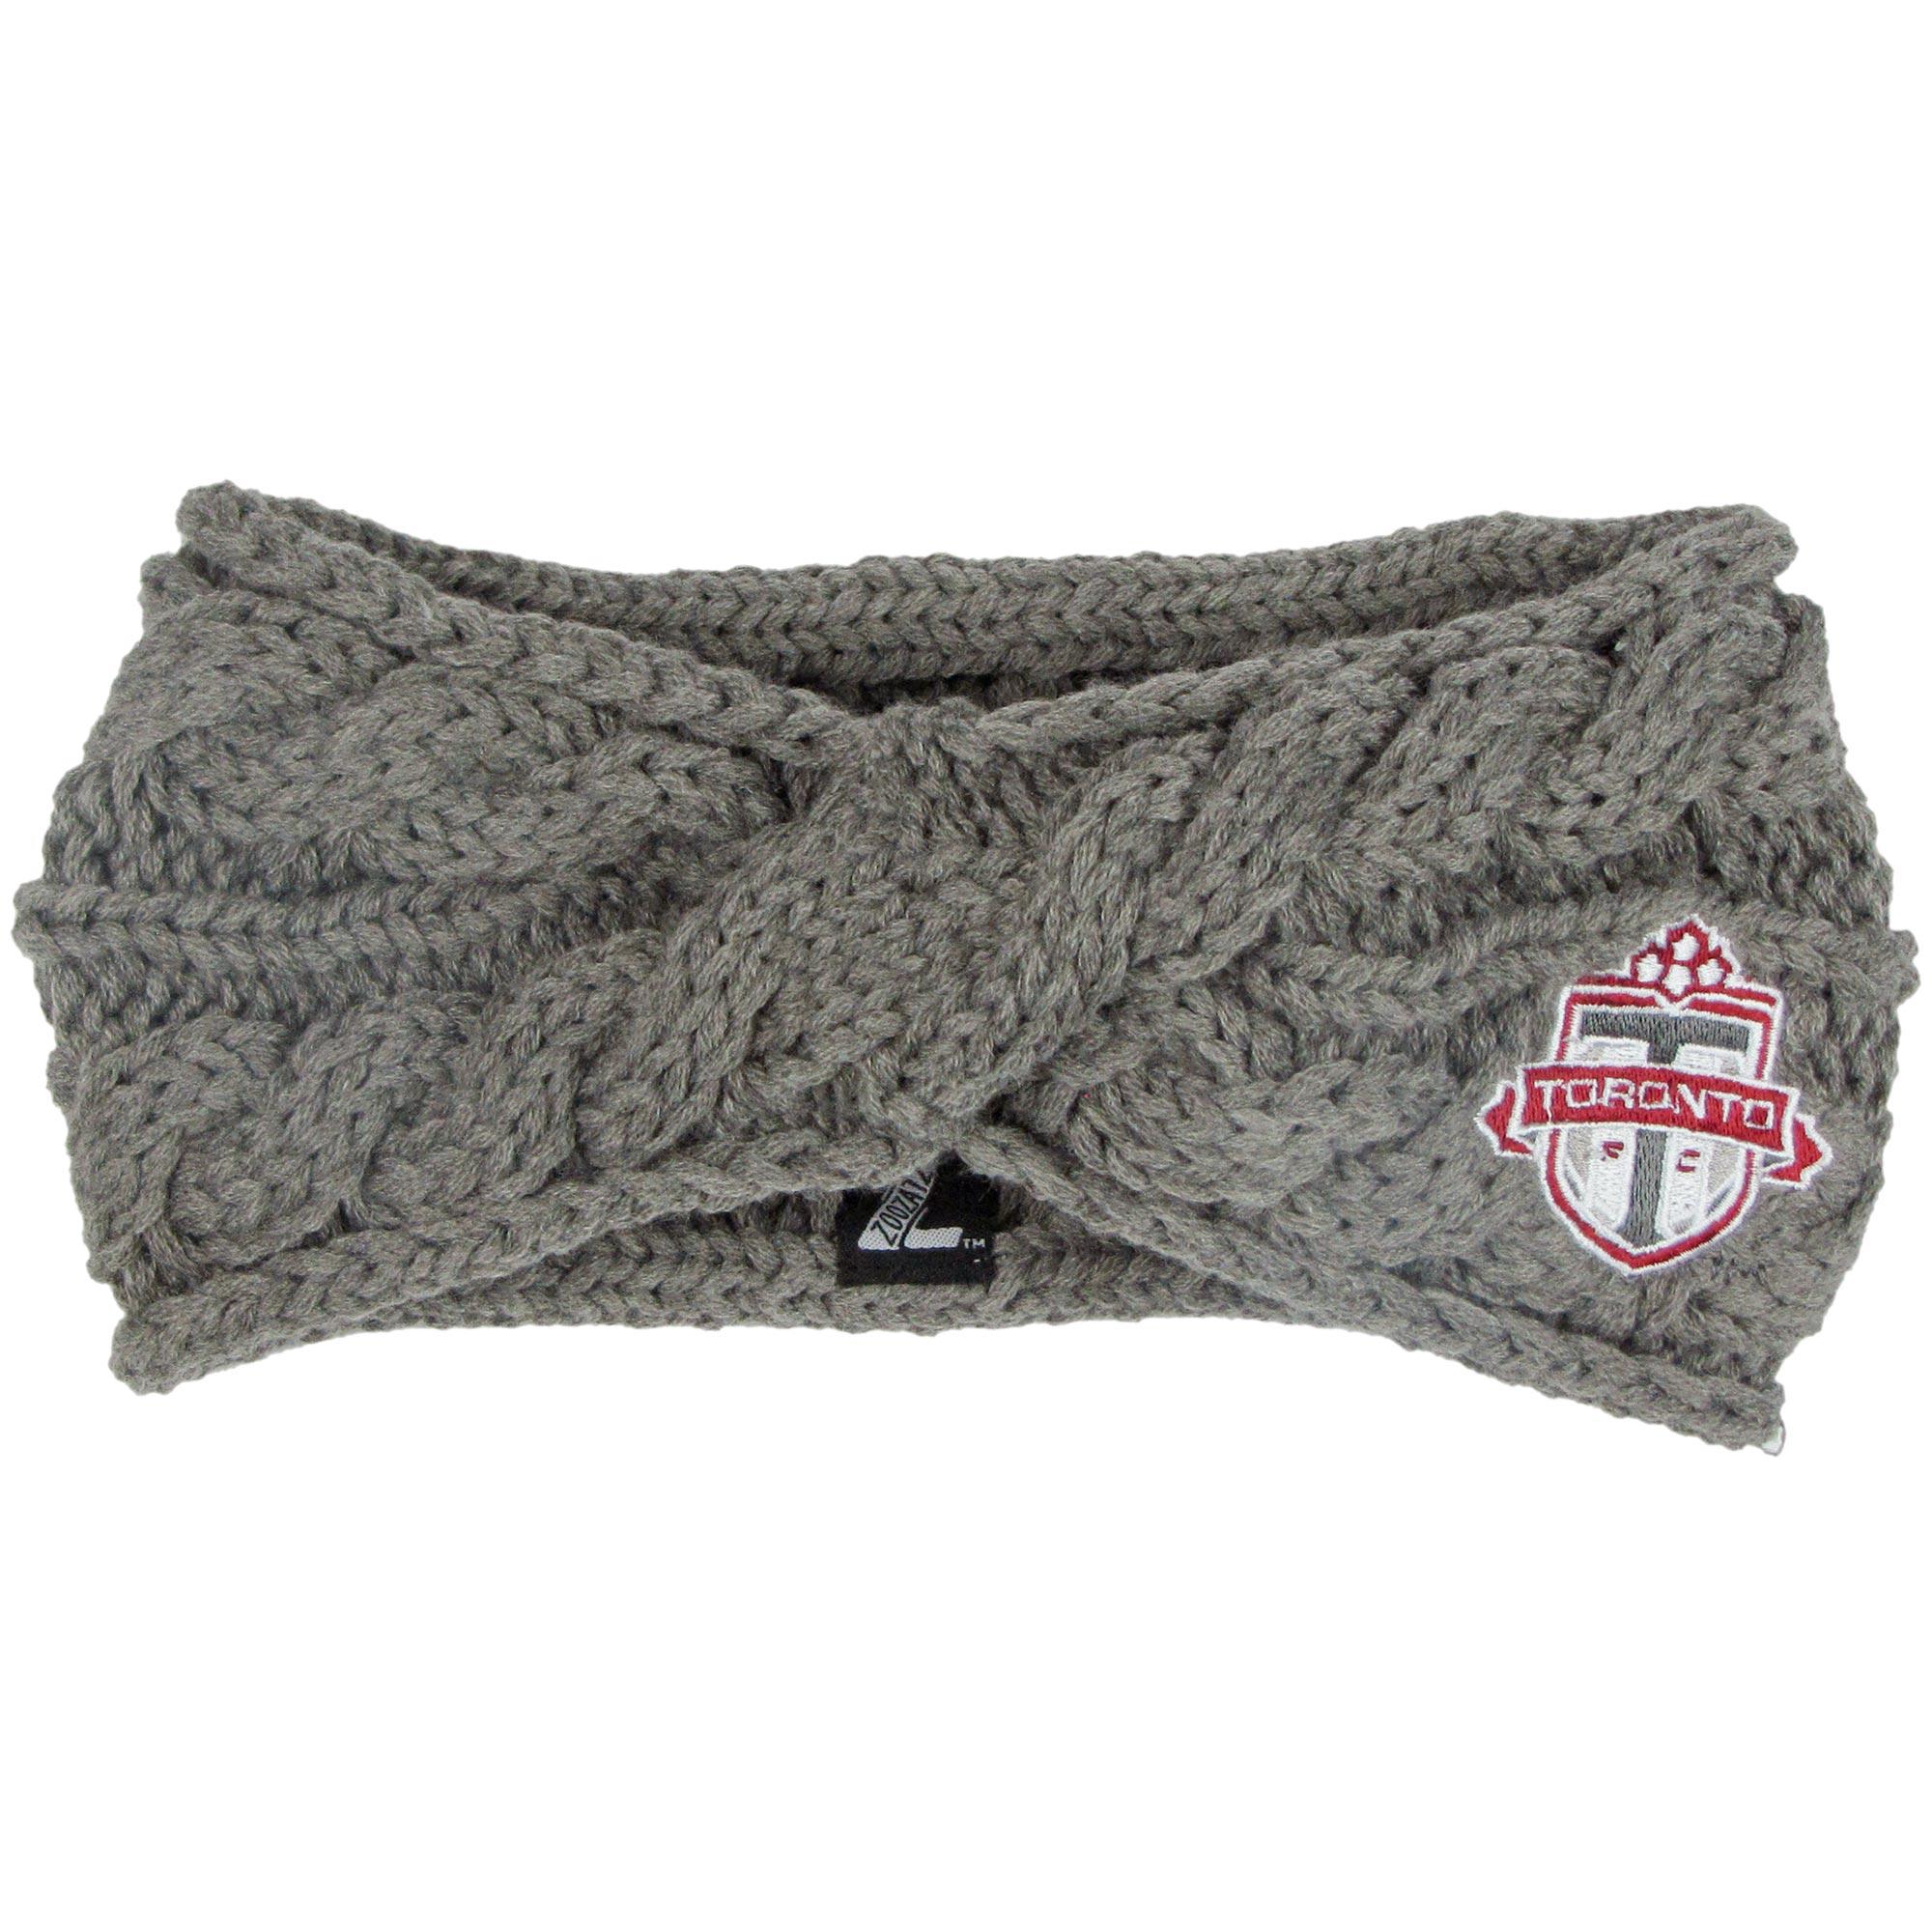 Toronto FC ZooZatz Women's Cable Headband - Charcoal - No Size